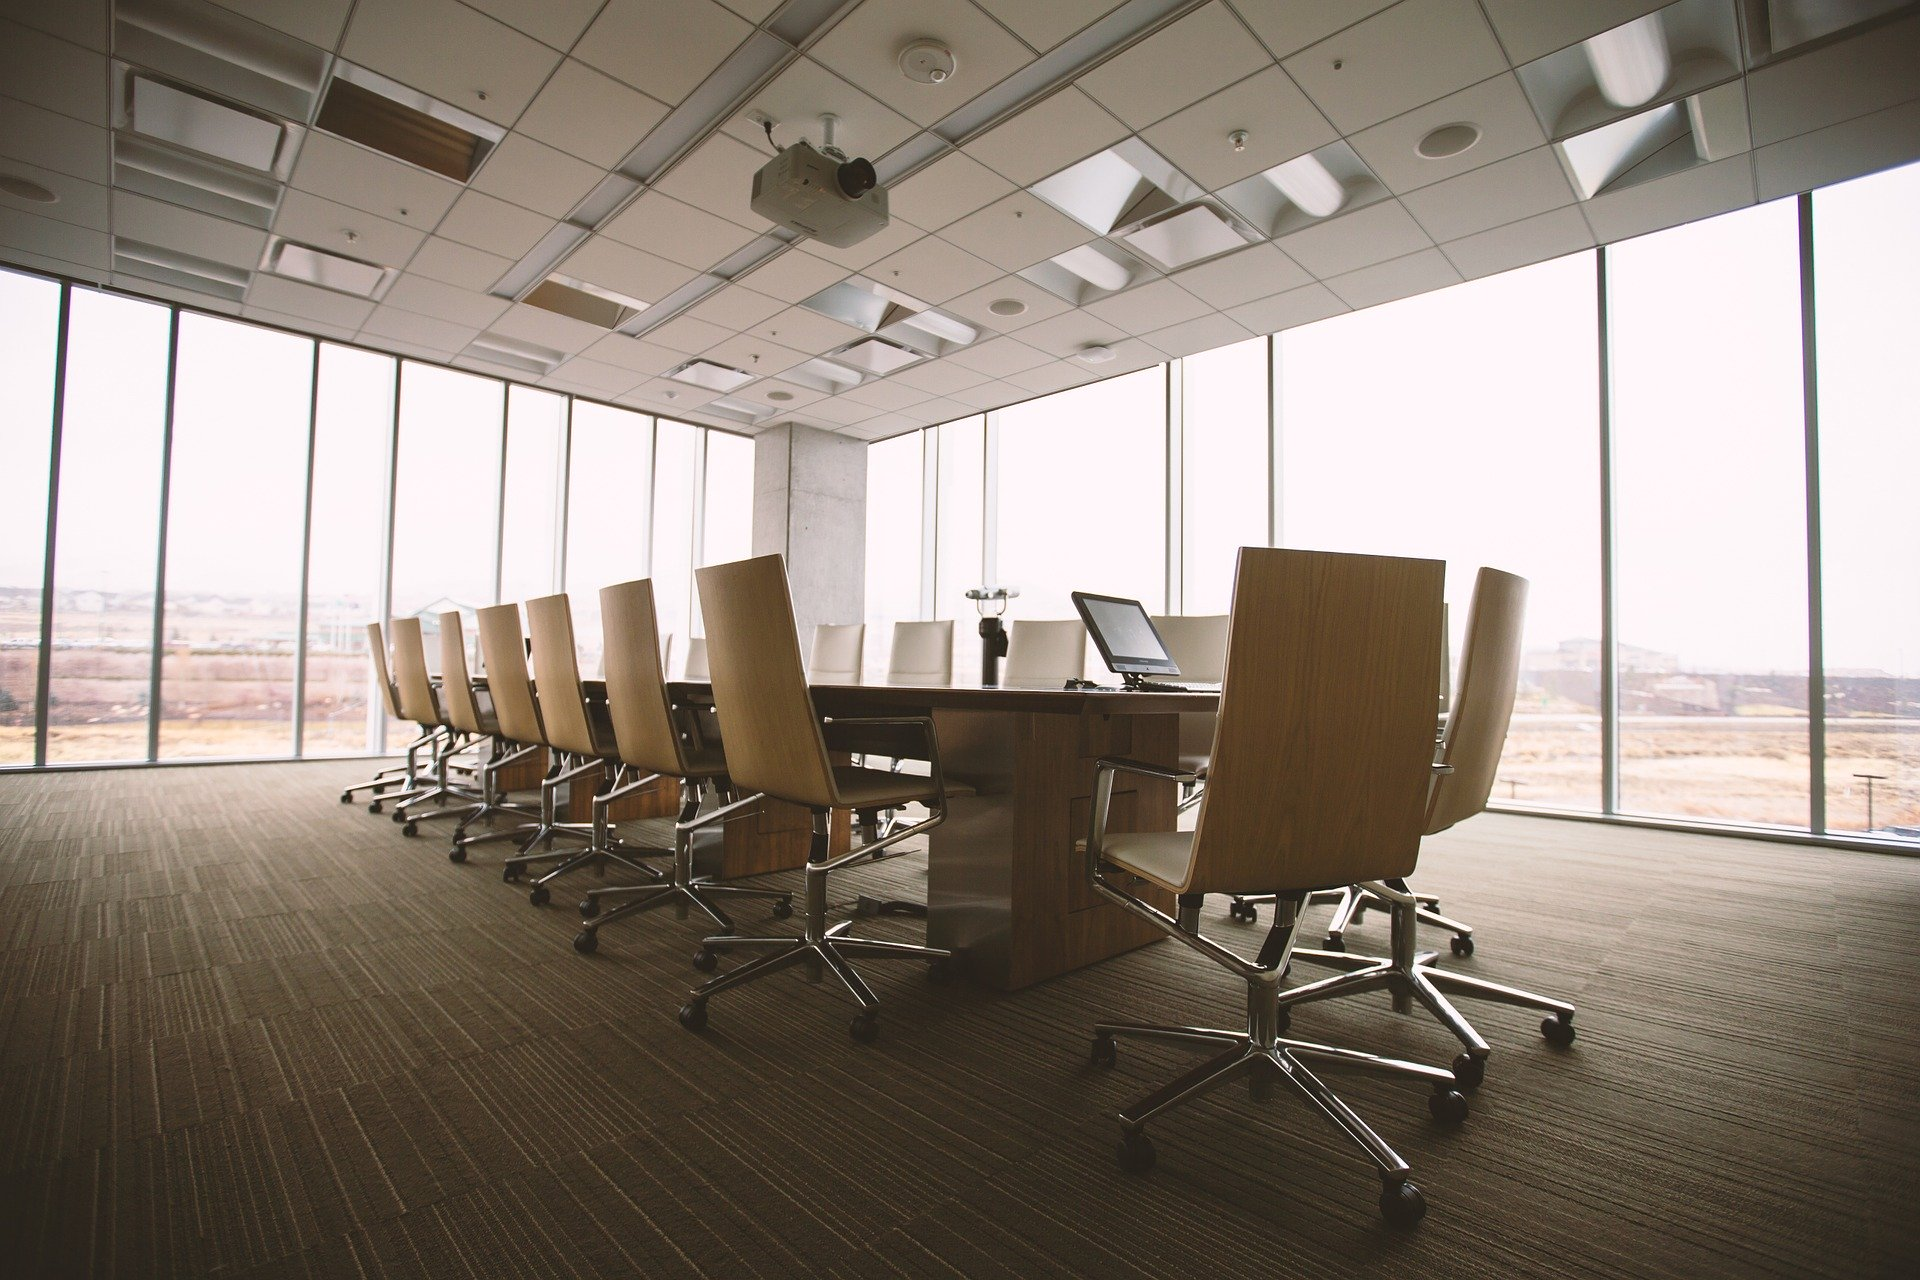 zasedaci mistnost zasedacka konference kancelar